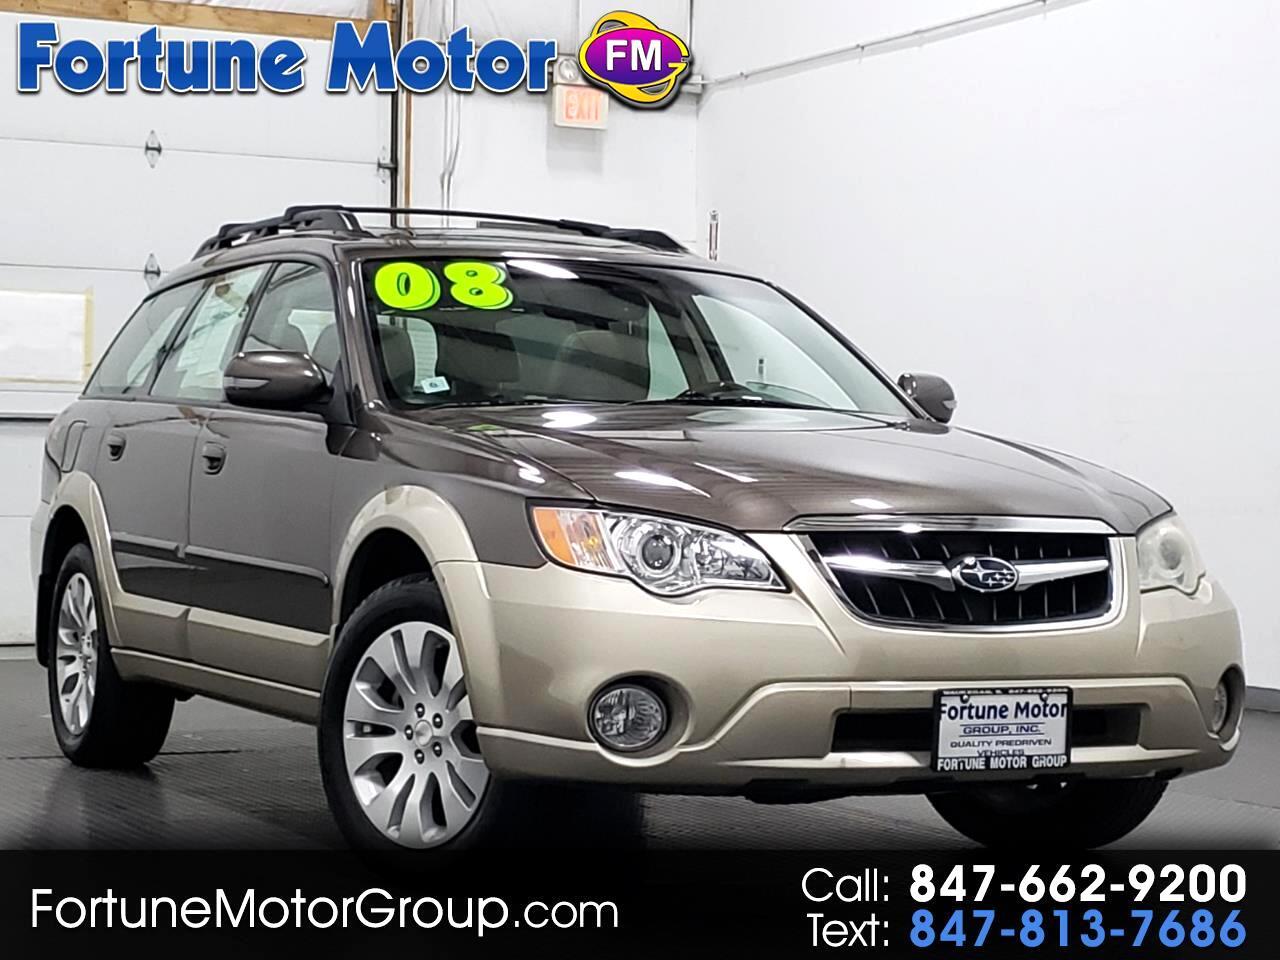 2008 Subaru Outback 3.0R L.L.Bean Edition